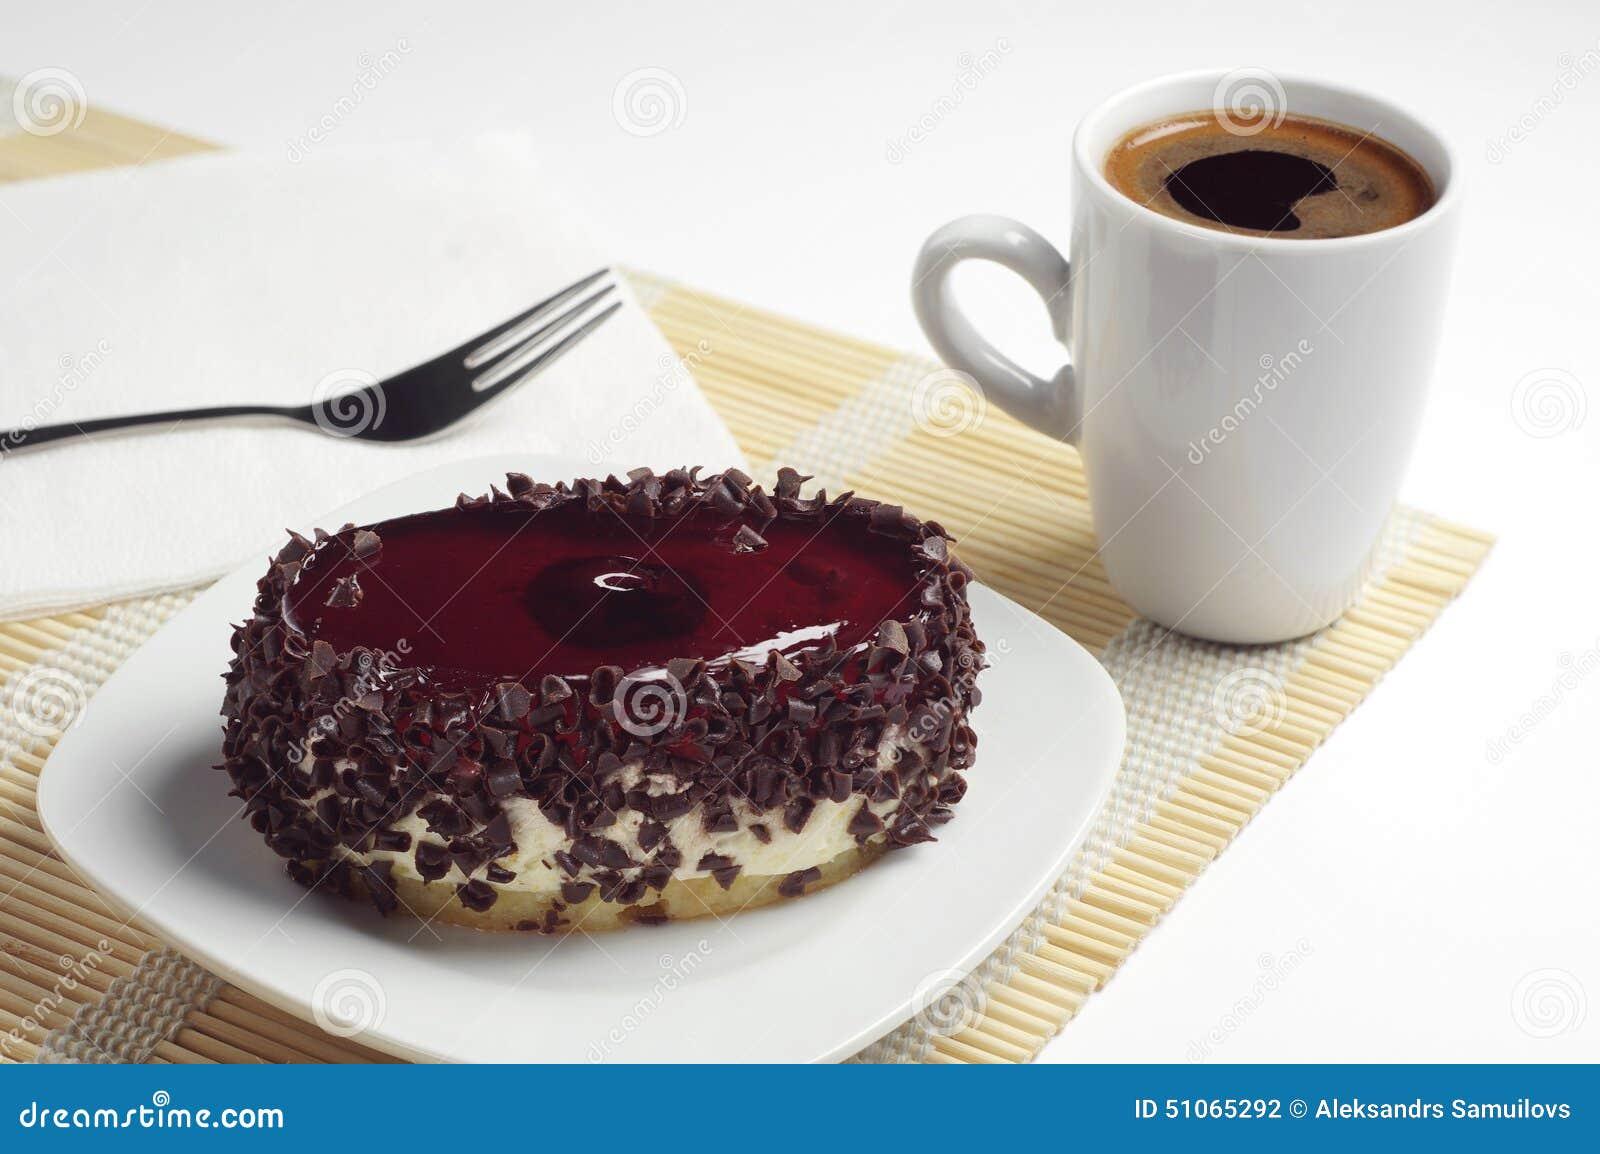 Chocolate Coffee Beans Cake Decoration